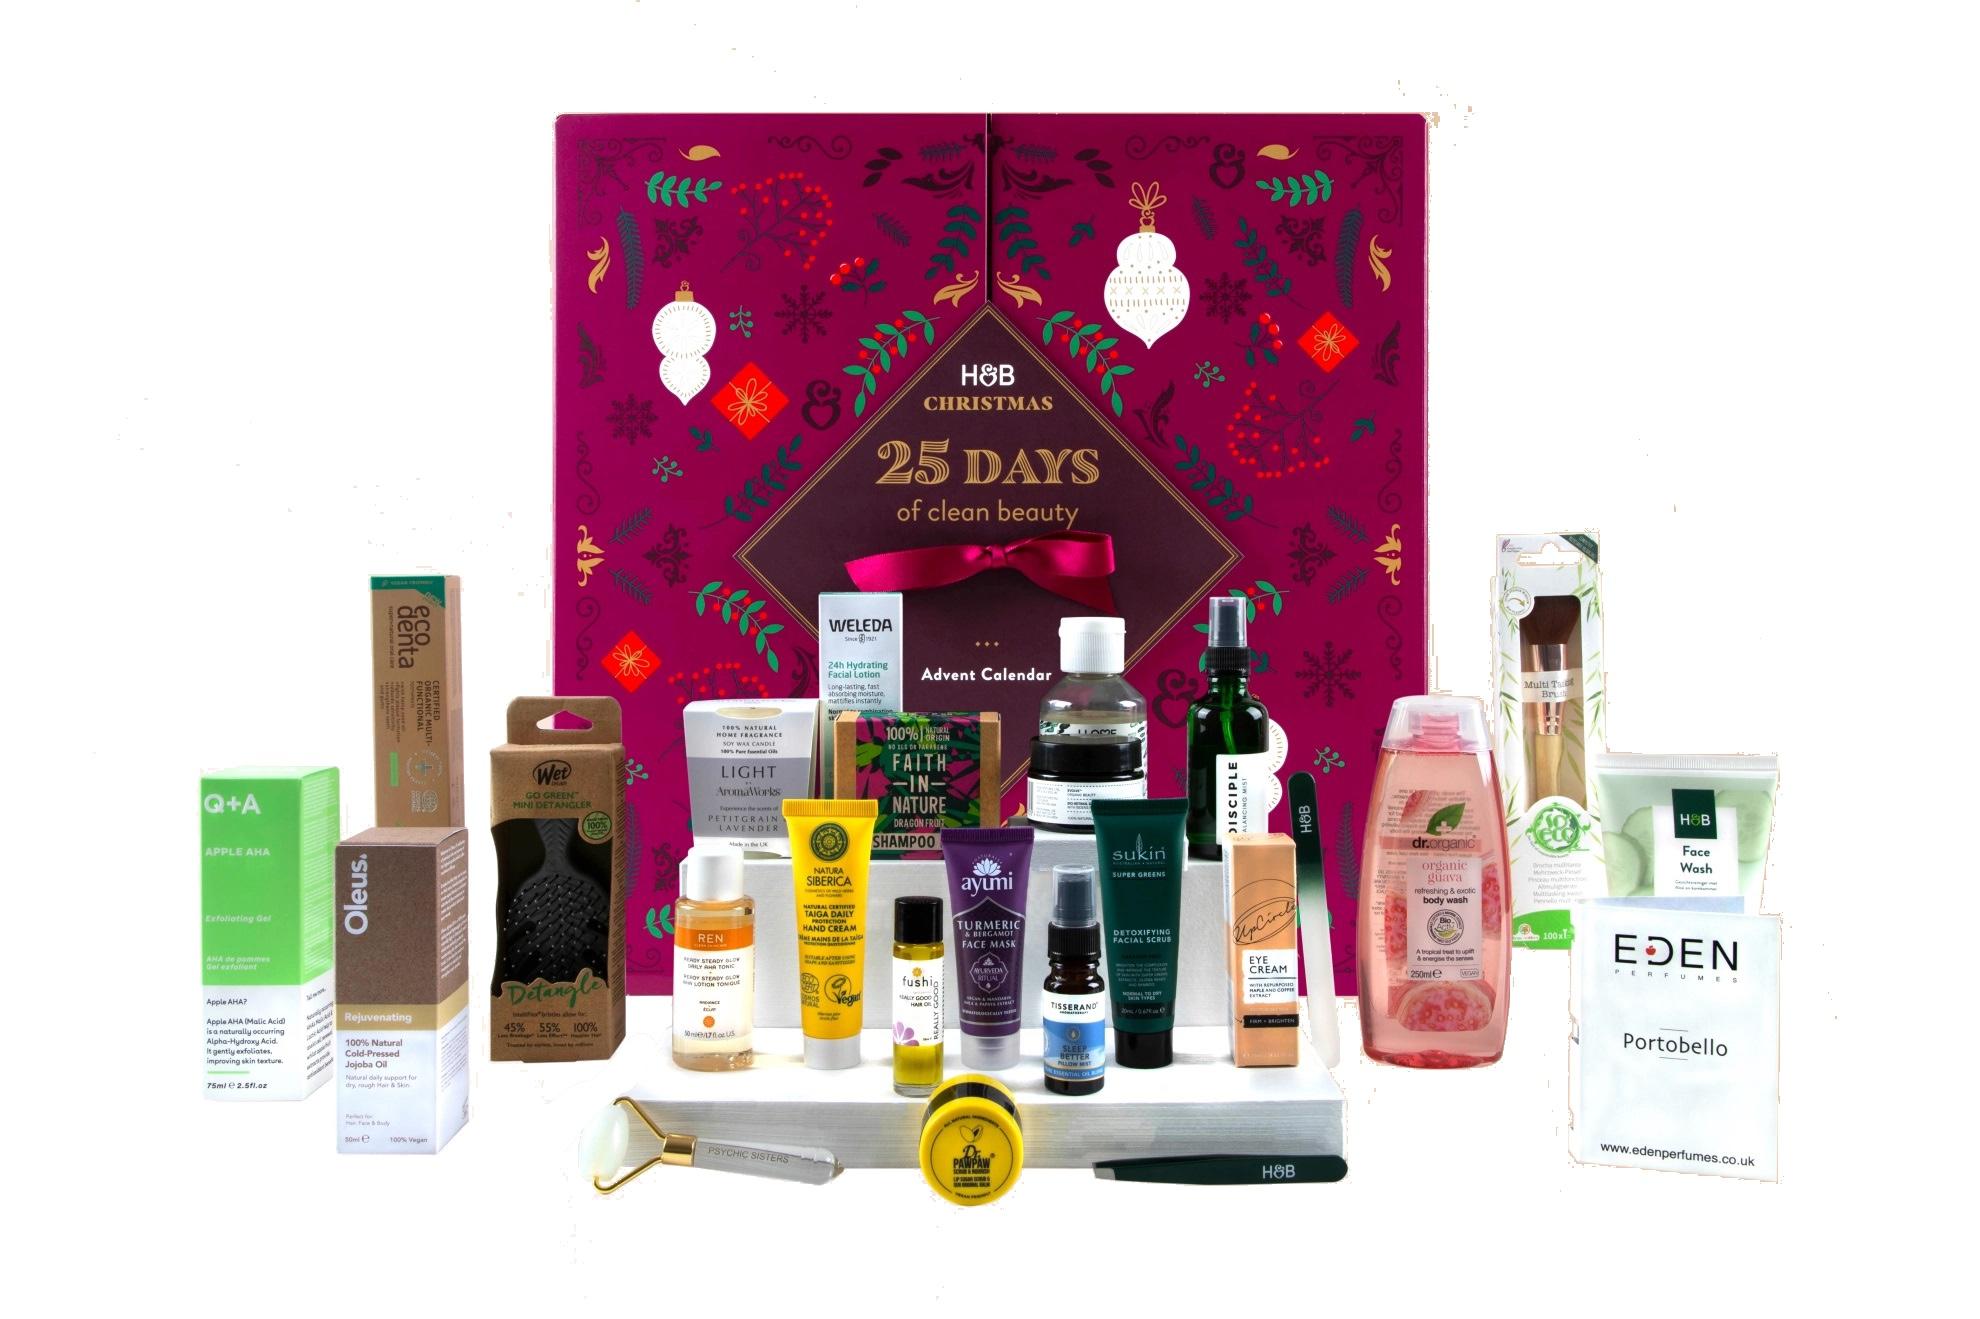 Holland & Barrett 25 Days Of Clean Beauty Advent Calendar 2021 Contents Reveal!